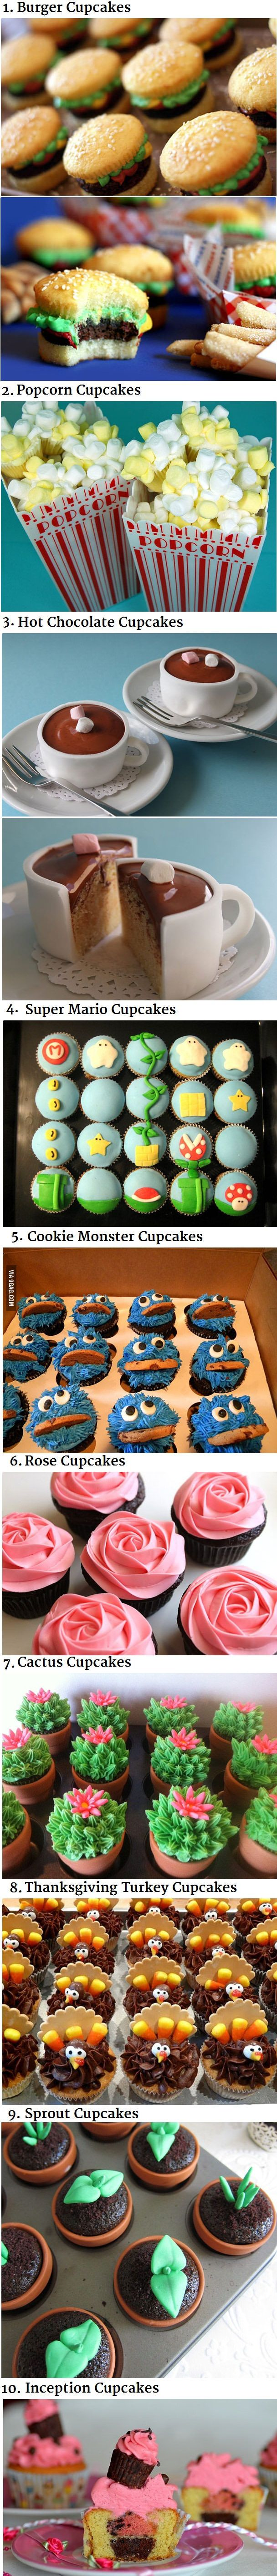 10 Awesome Cupcake Decorating Ideas